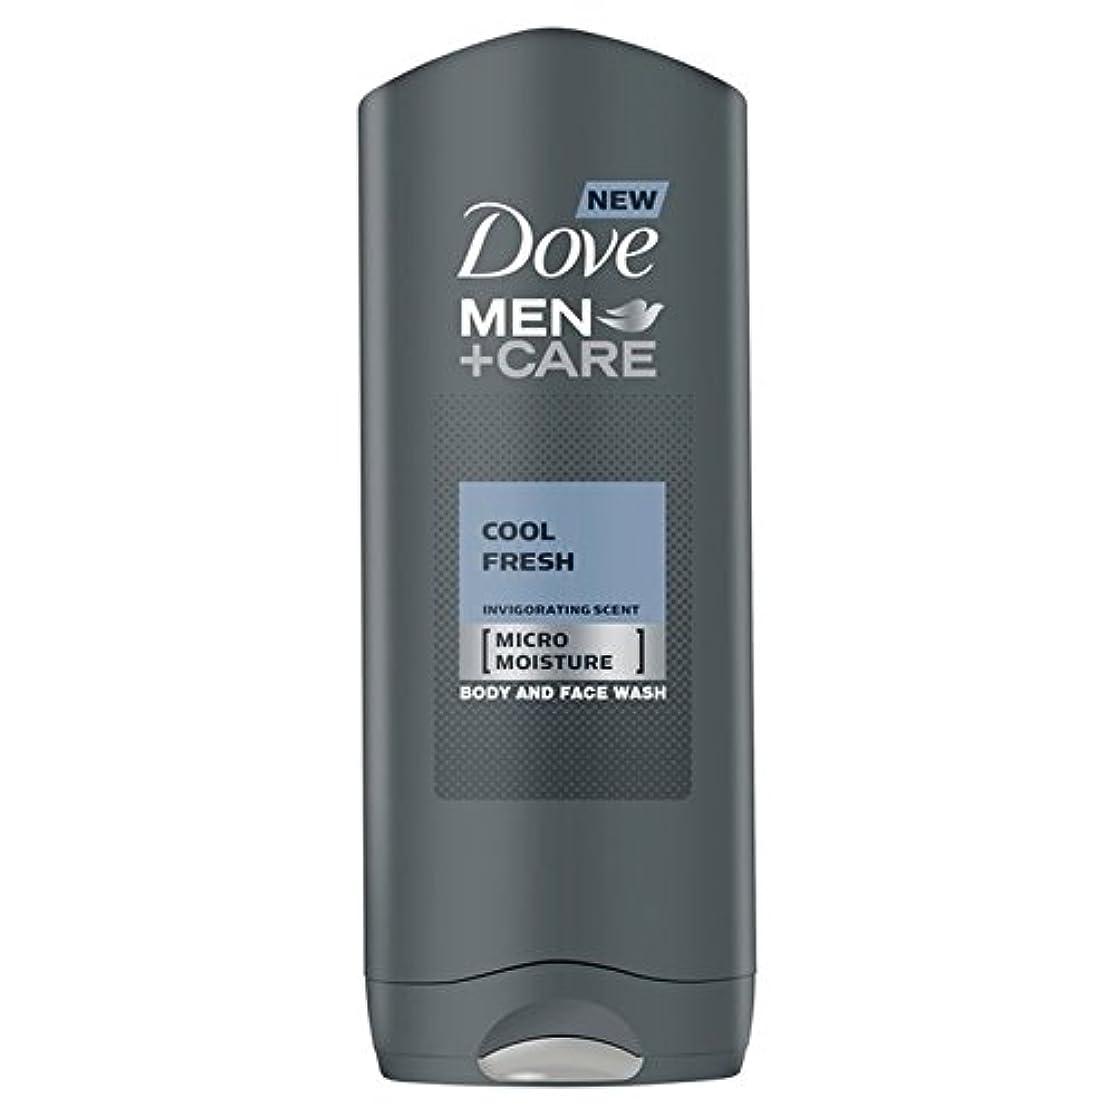 Dove Men+Care Cool Fresh Shower Gel 400ml - クールフレッシュシャワージェル400ミリリットルケア+鳩の男性 [並行輸入品]